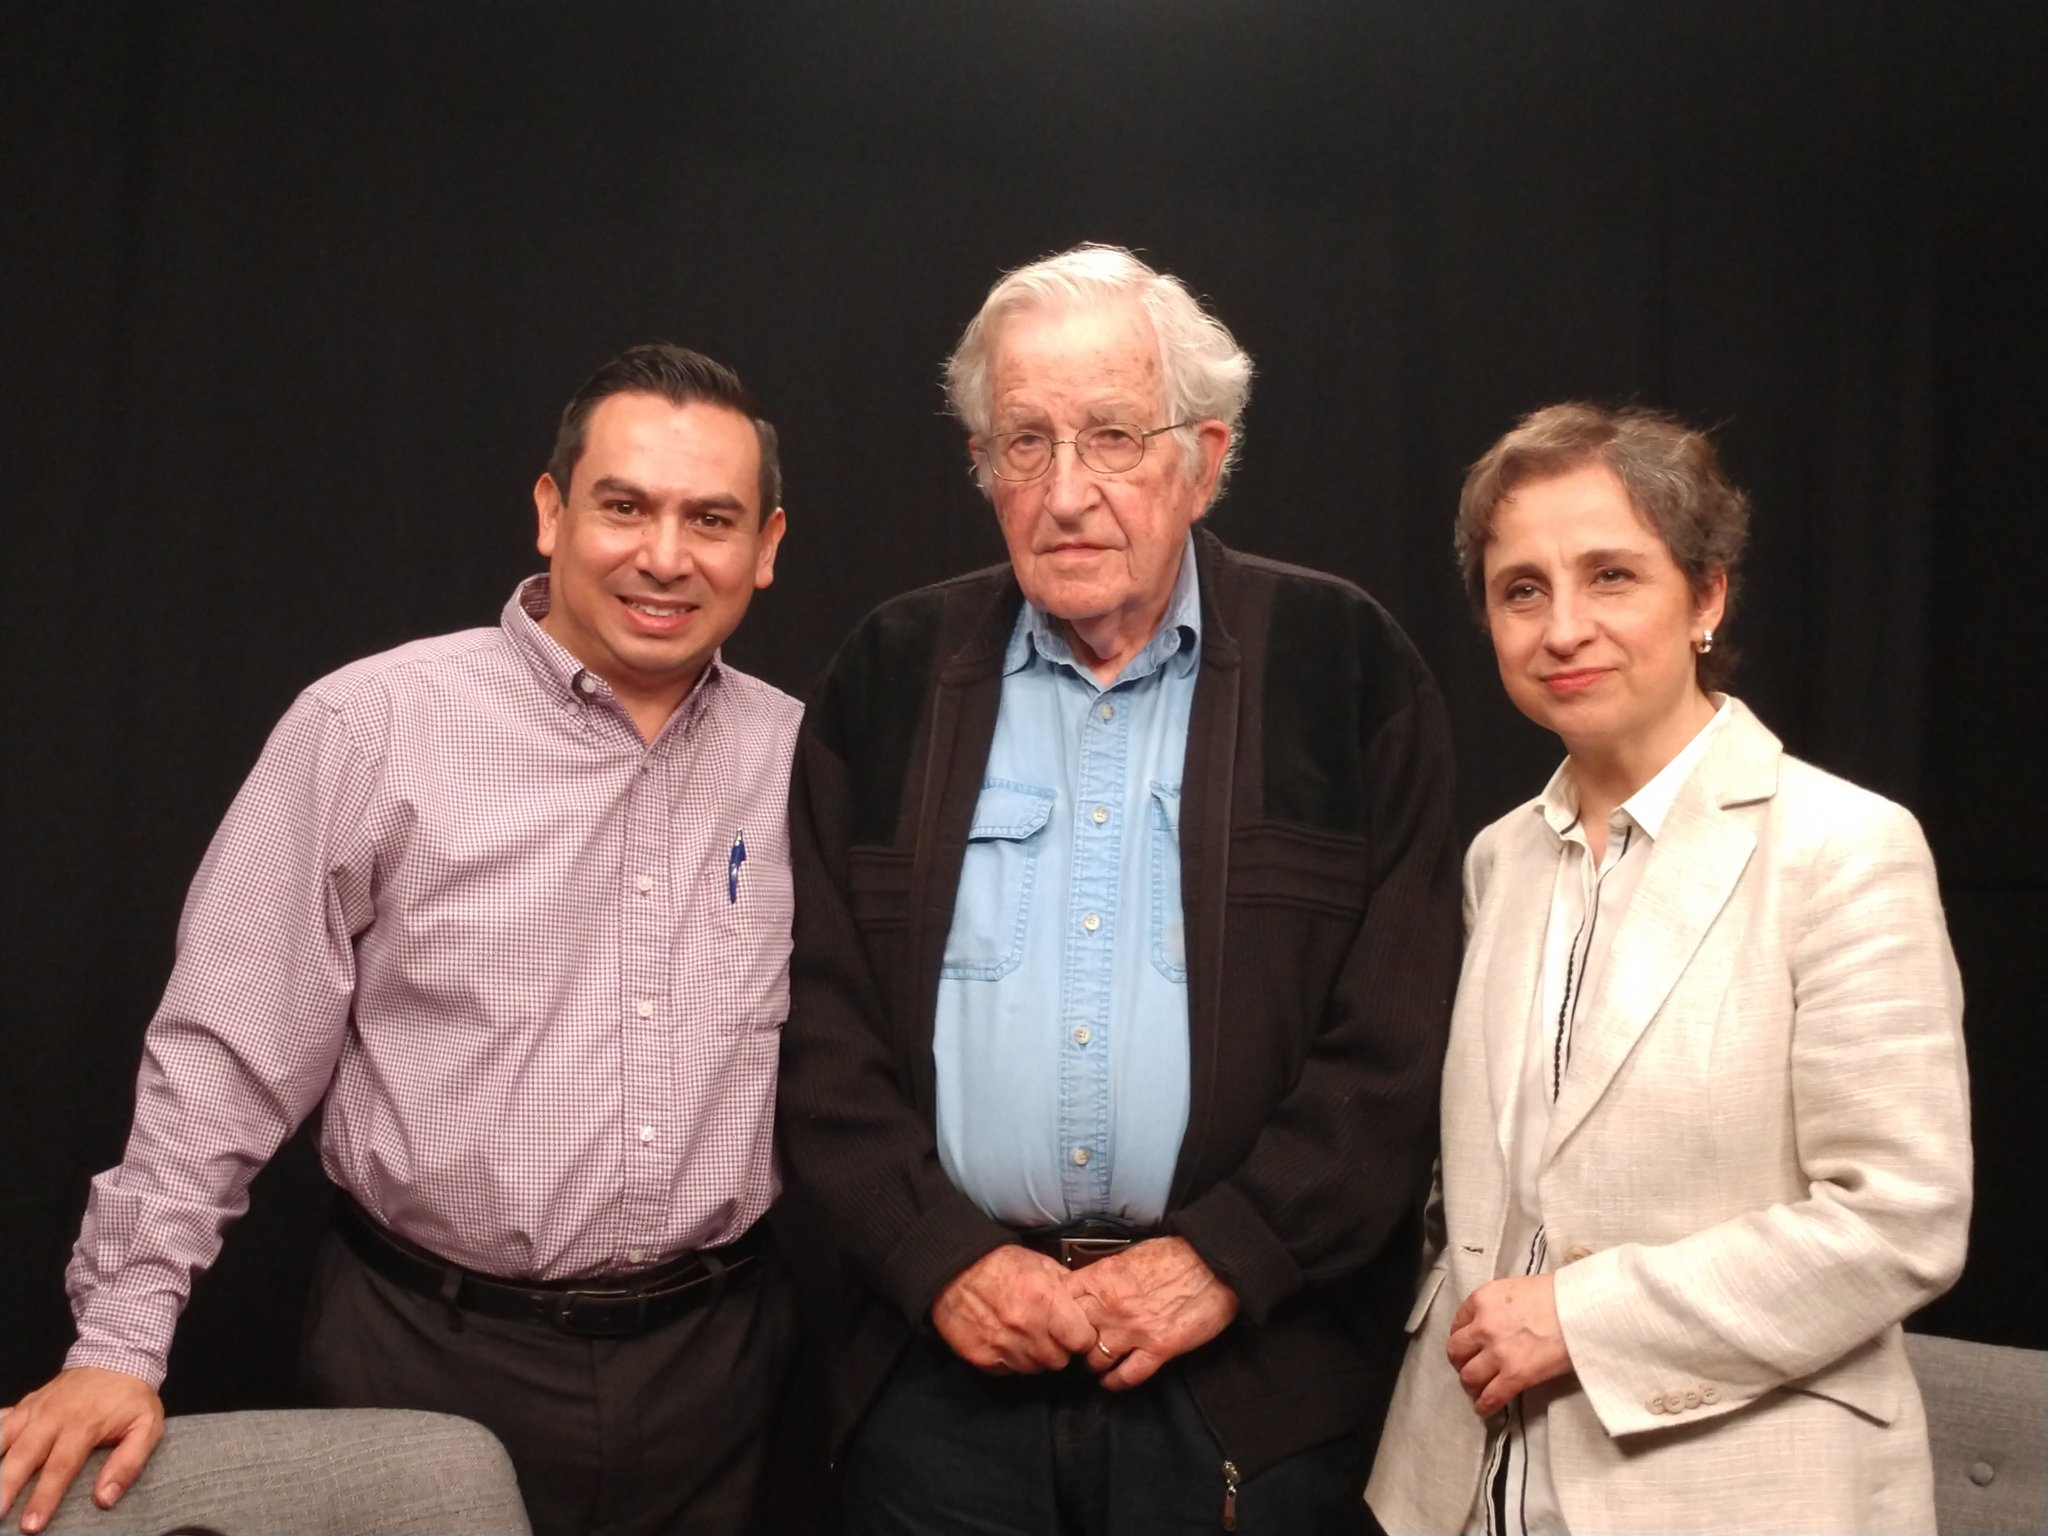 photo of Luis Coronado Guel, Noam Chomsky, and Carmen Aristegui